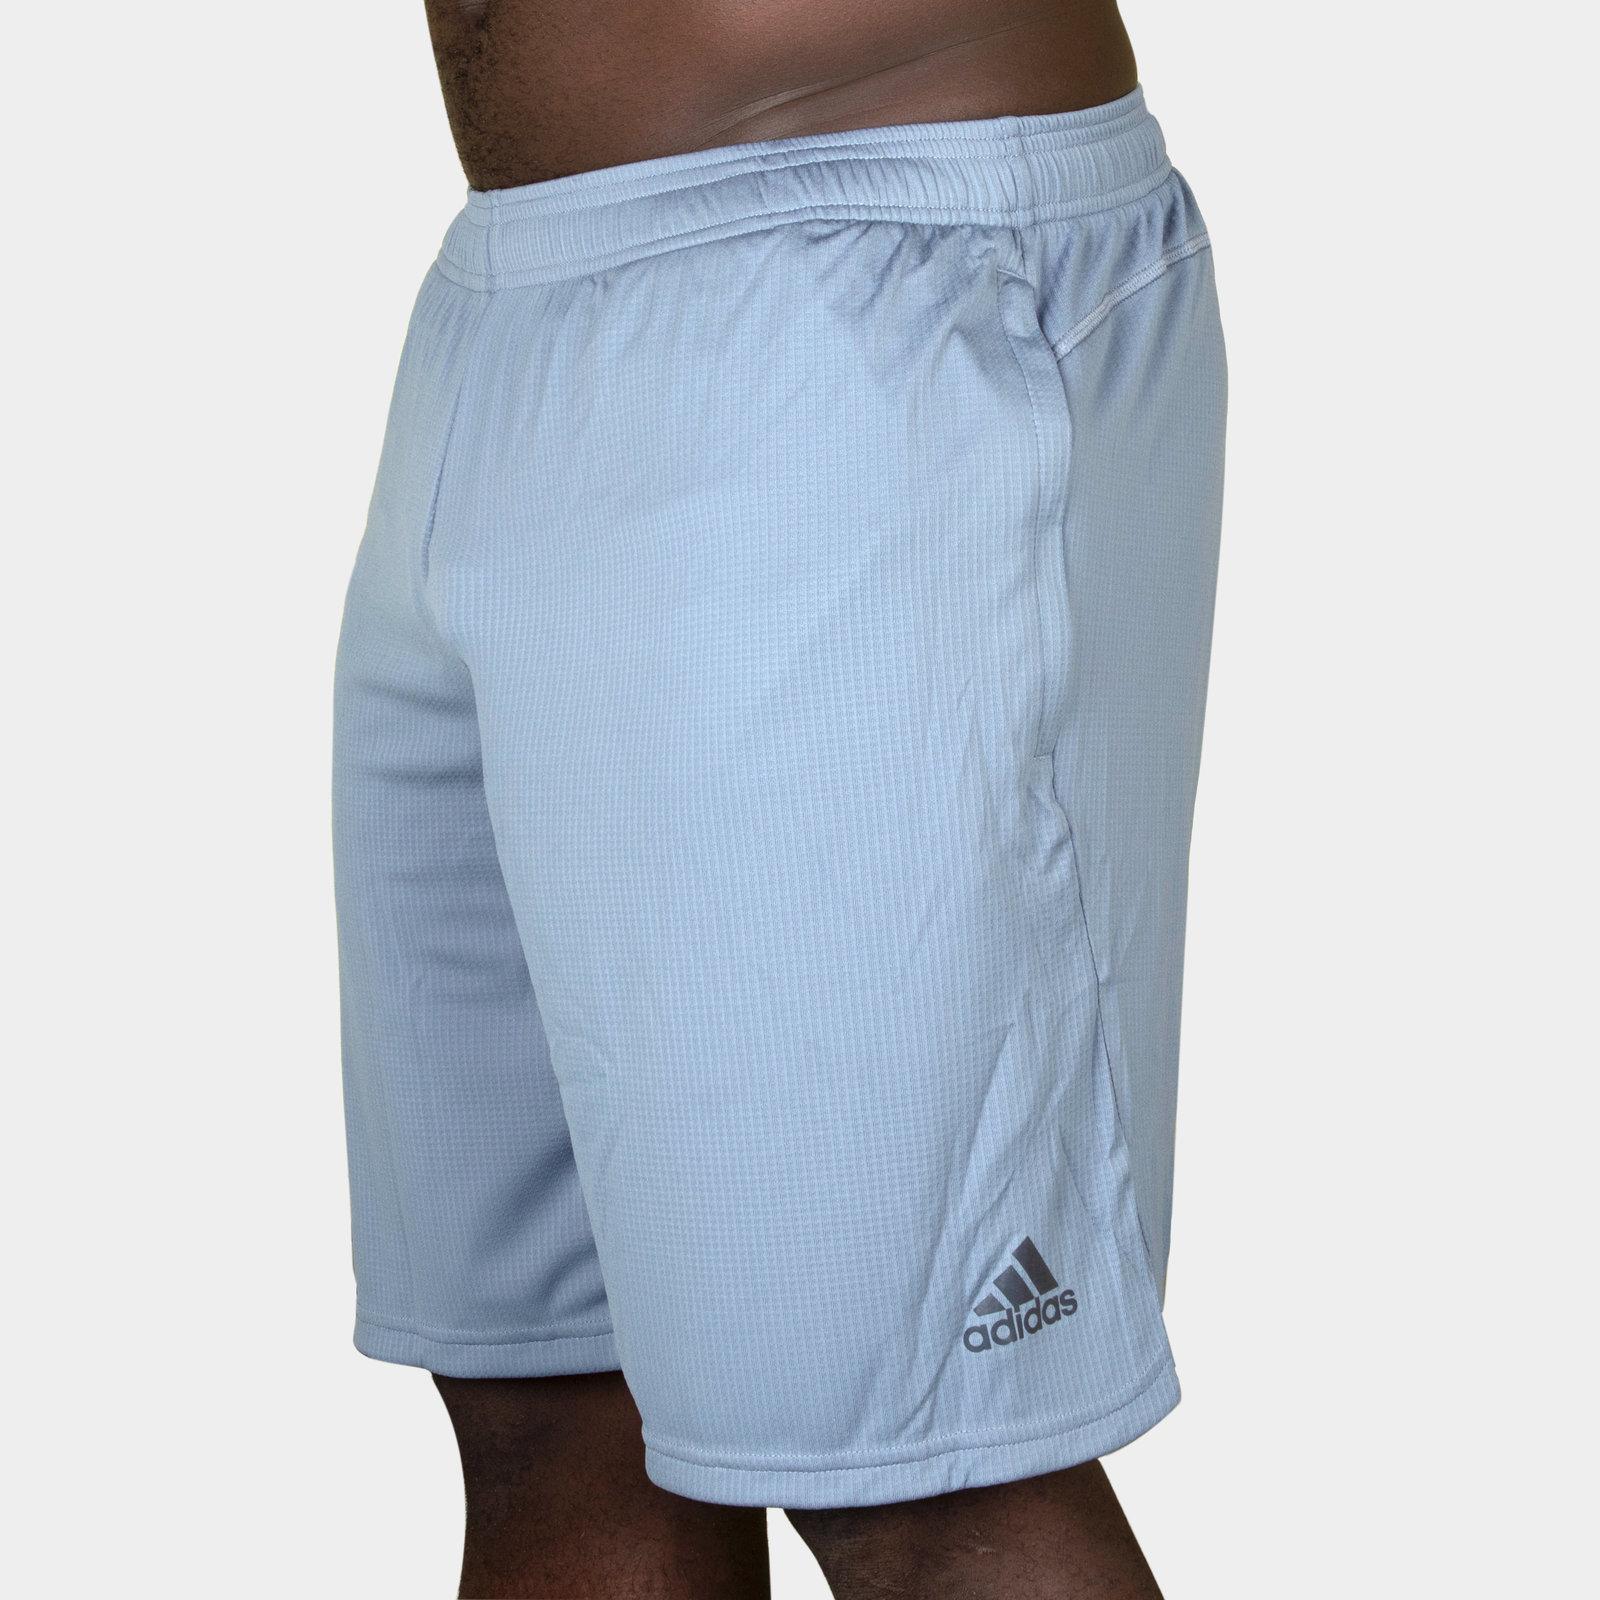 Image of 4KRFT Climachill Training Shorts